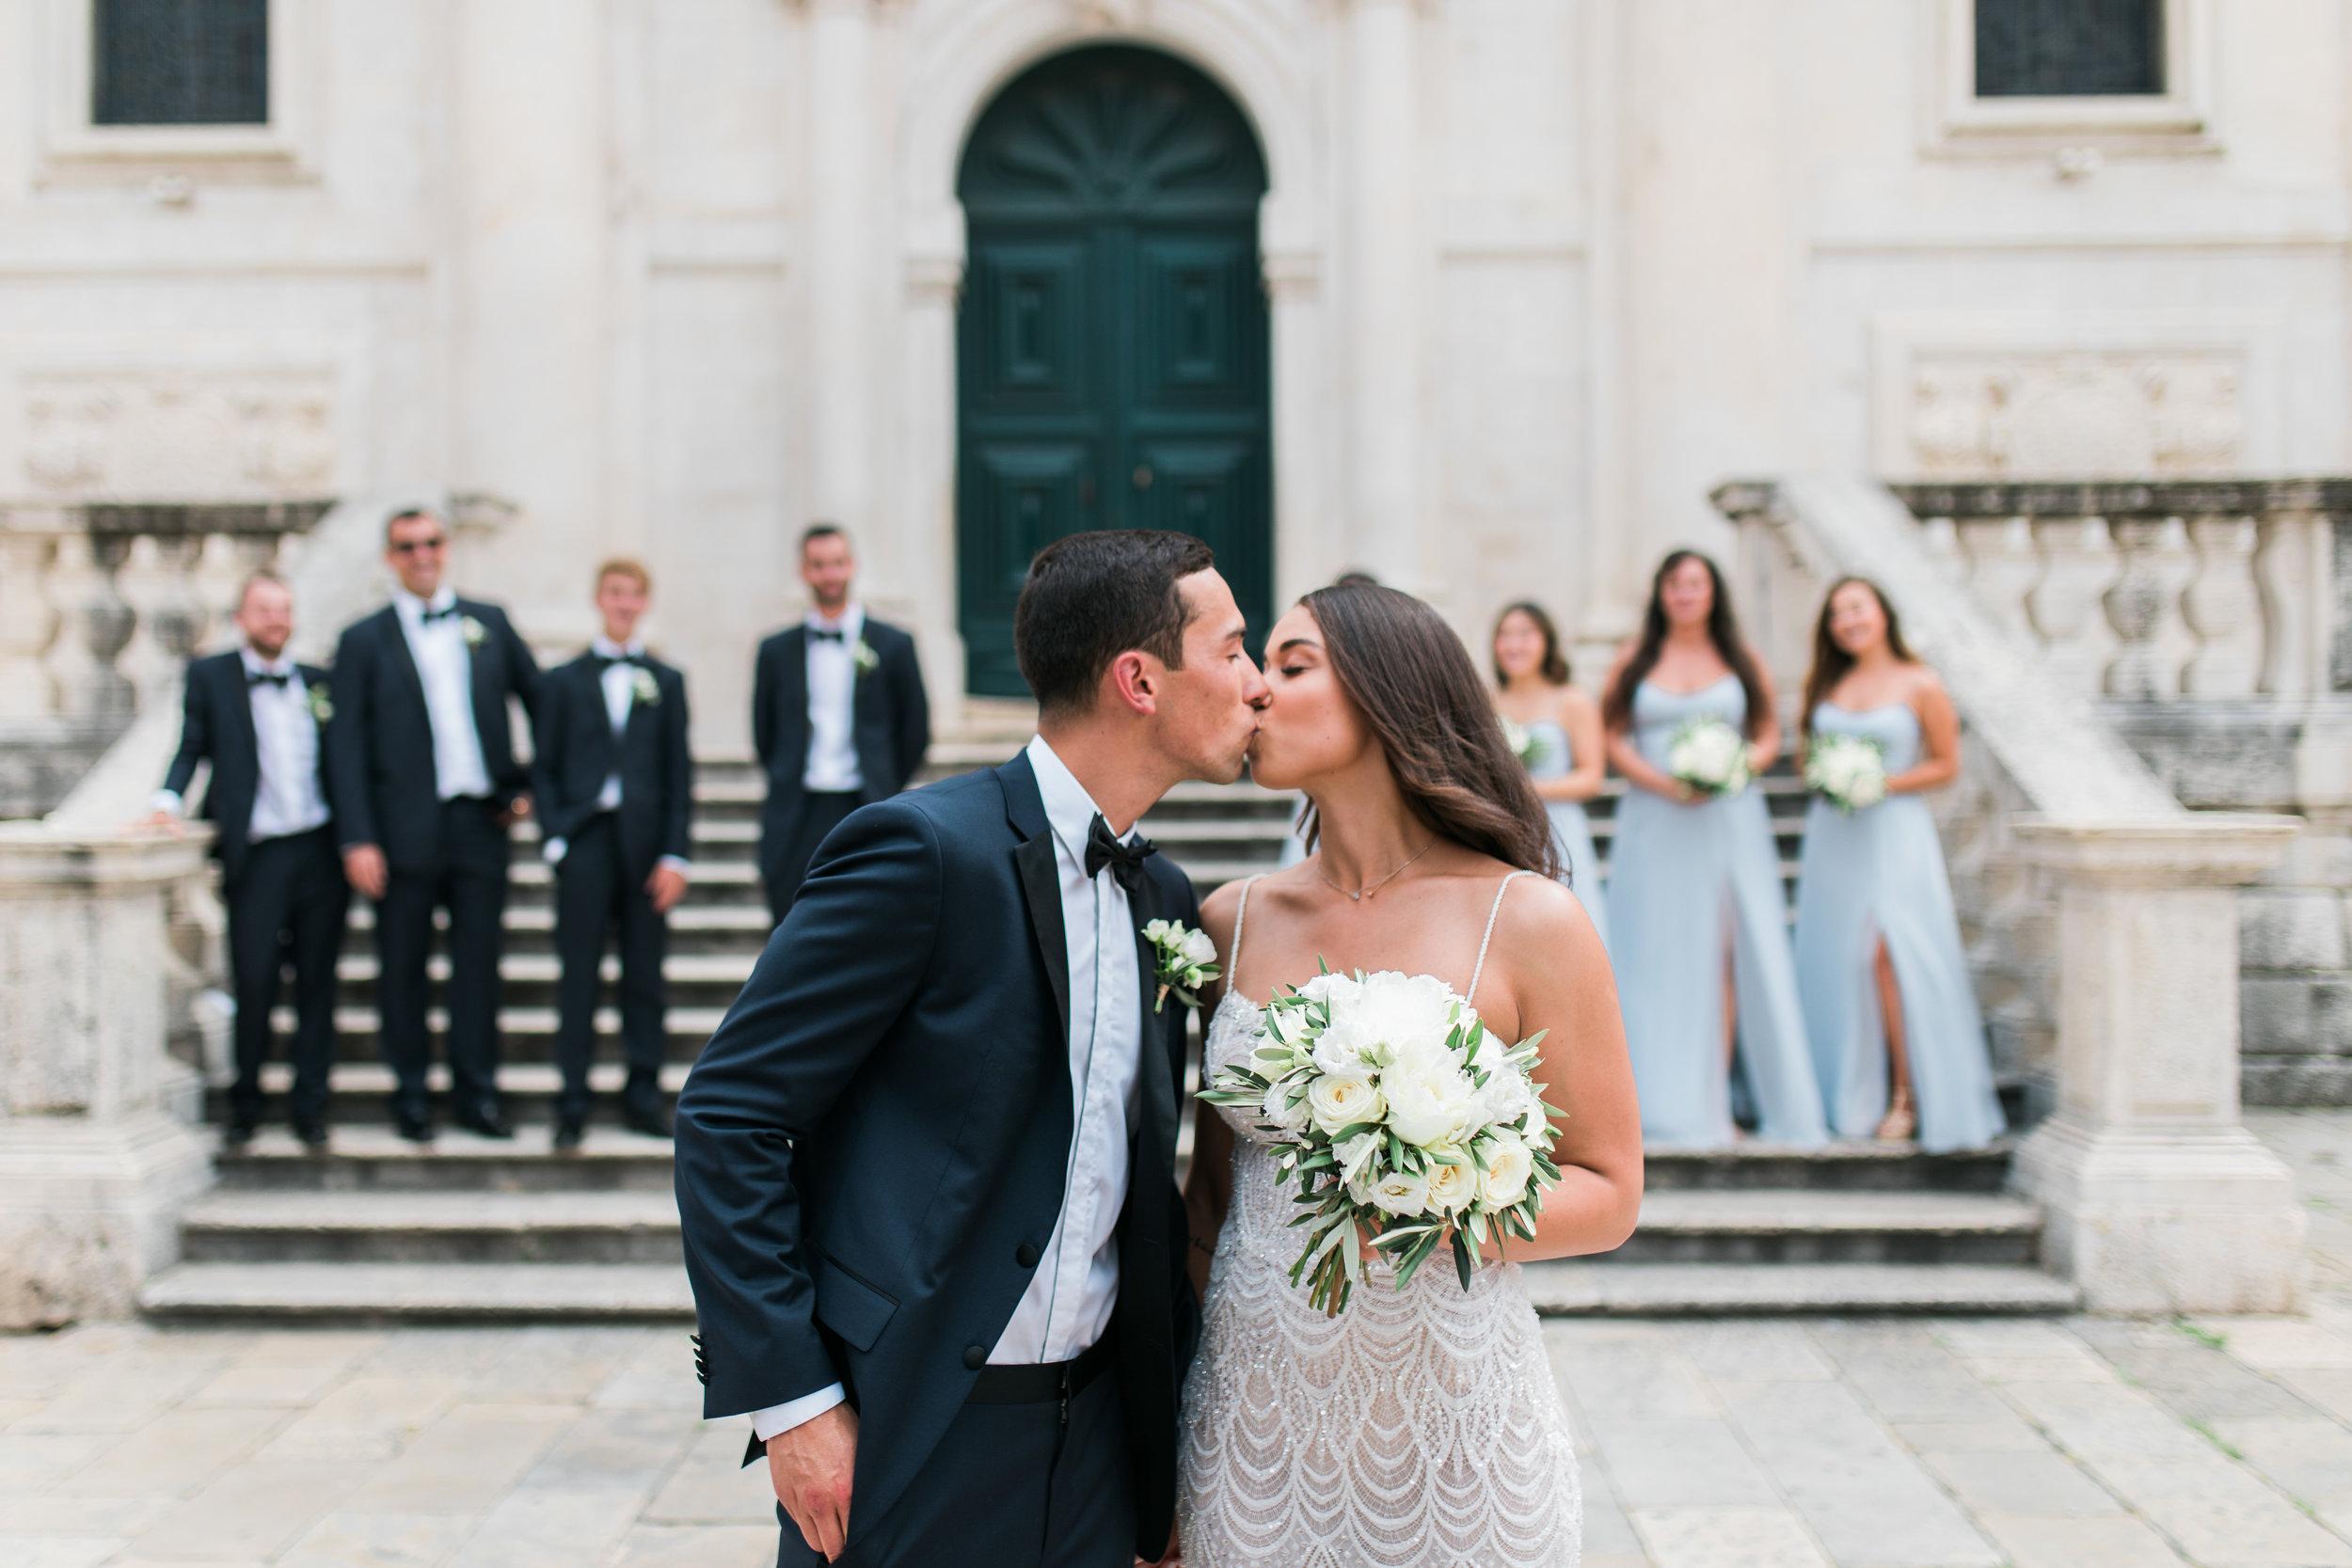 Dubrovnik-Wedding-Photographer-Croatia-Wedding-Photos-JBJ-Pictures-7.jpg